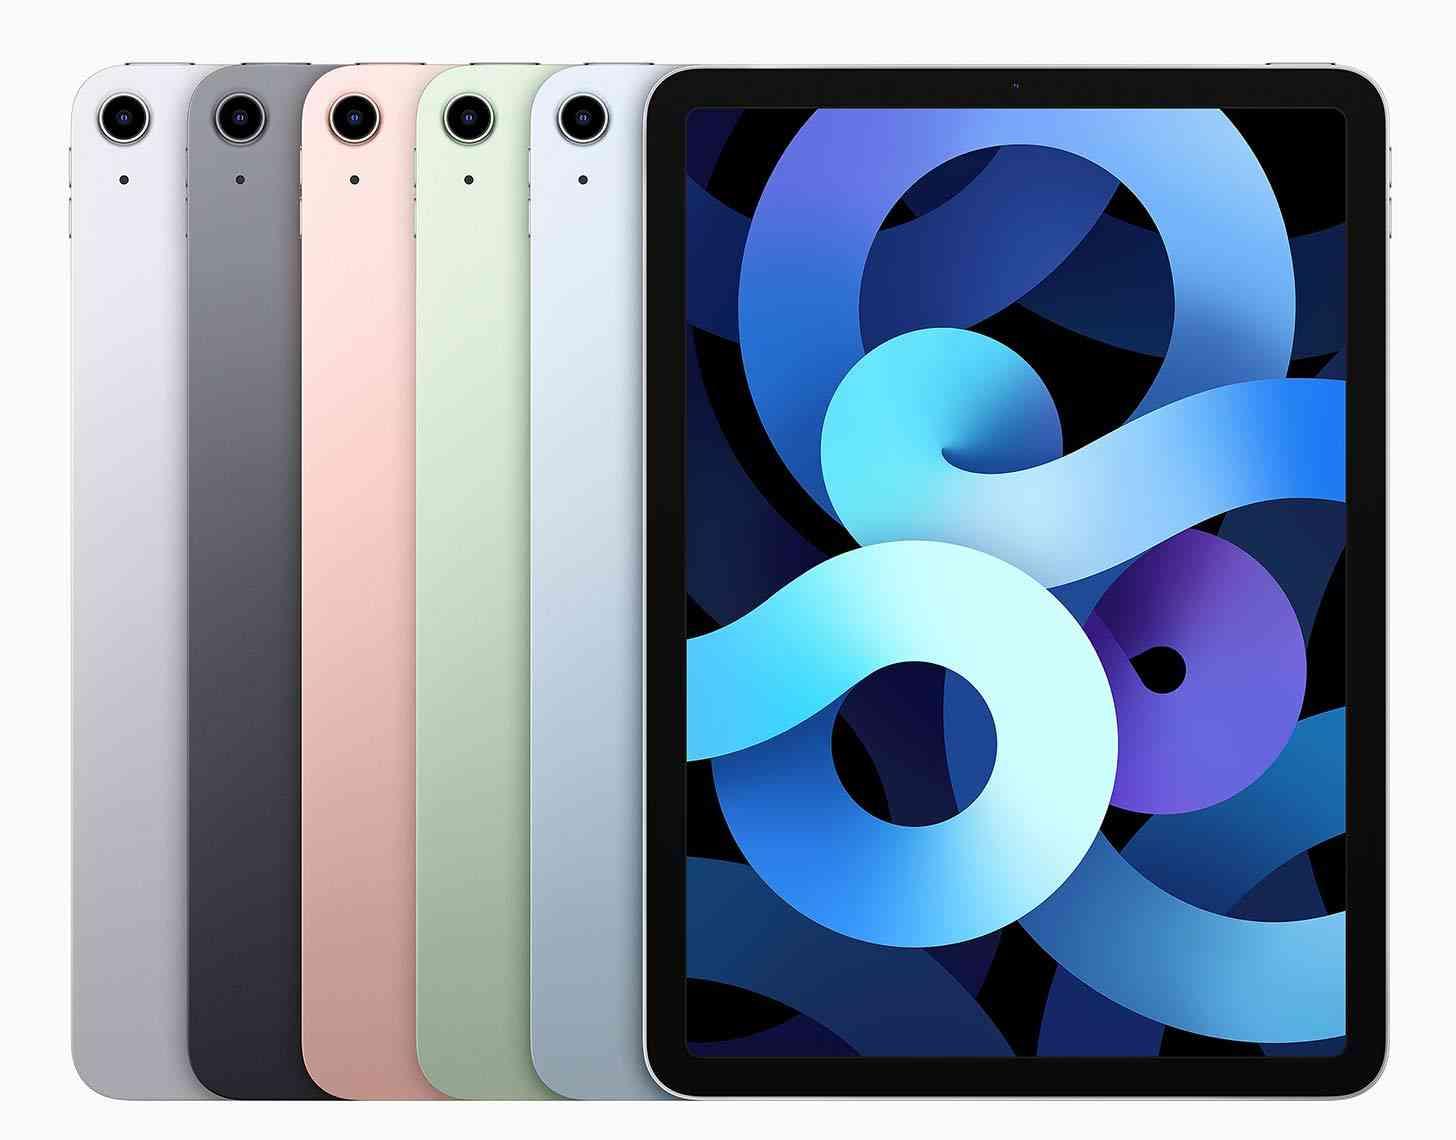 iPad Air 3rd generation colors